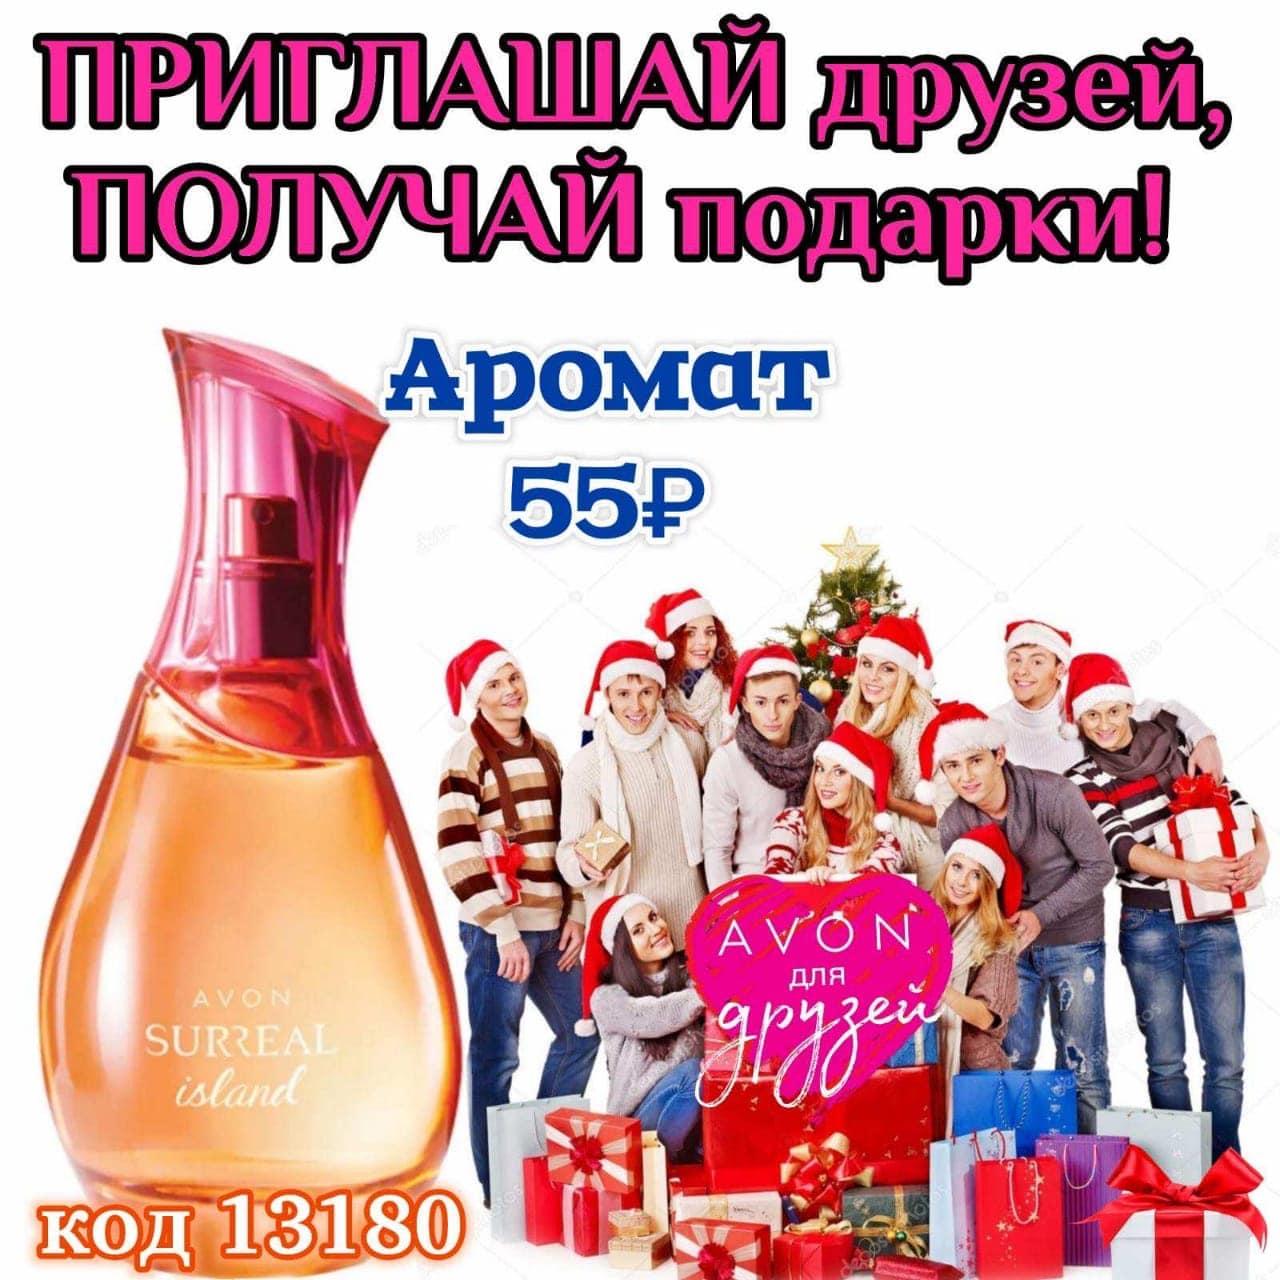 подарок за рекомендацию Avon в 1 каталоге 2021